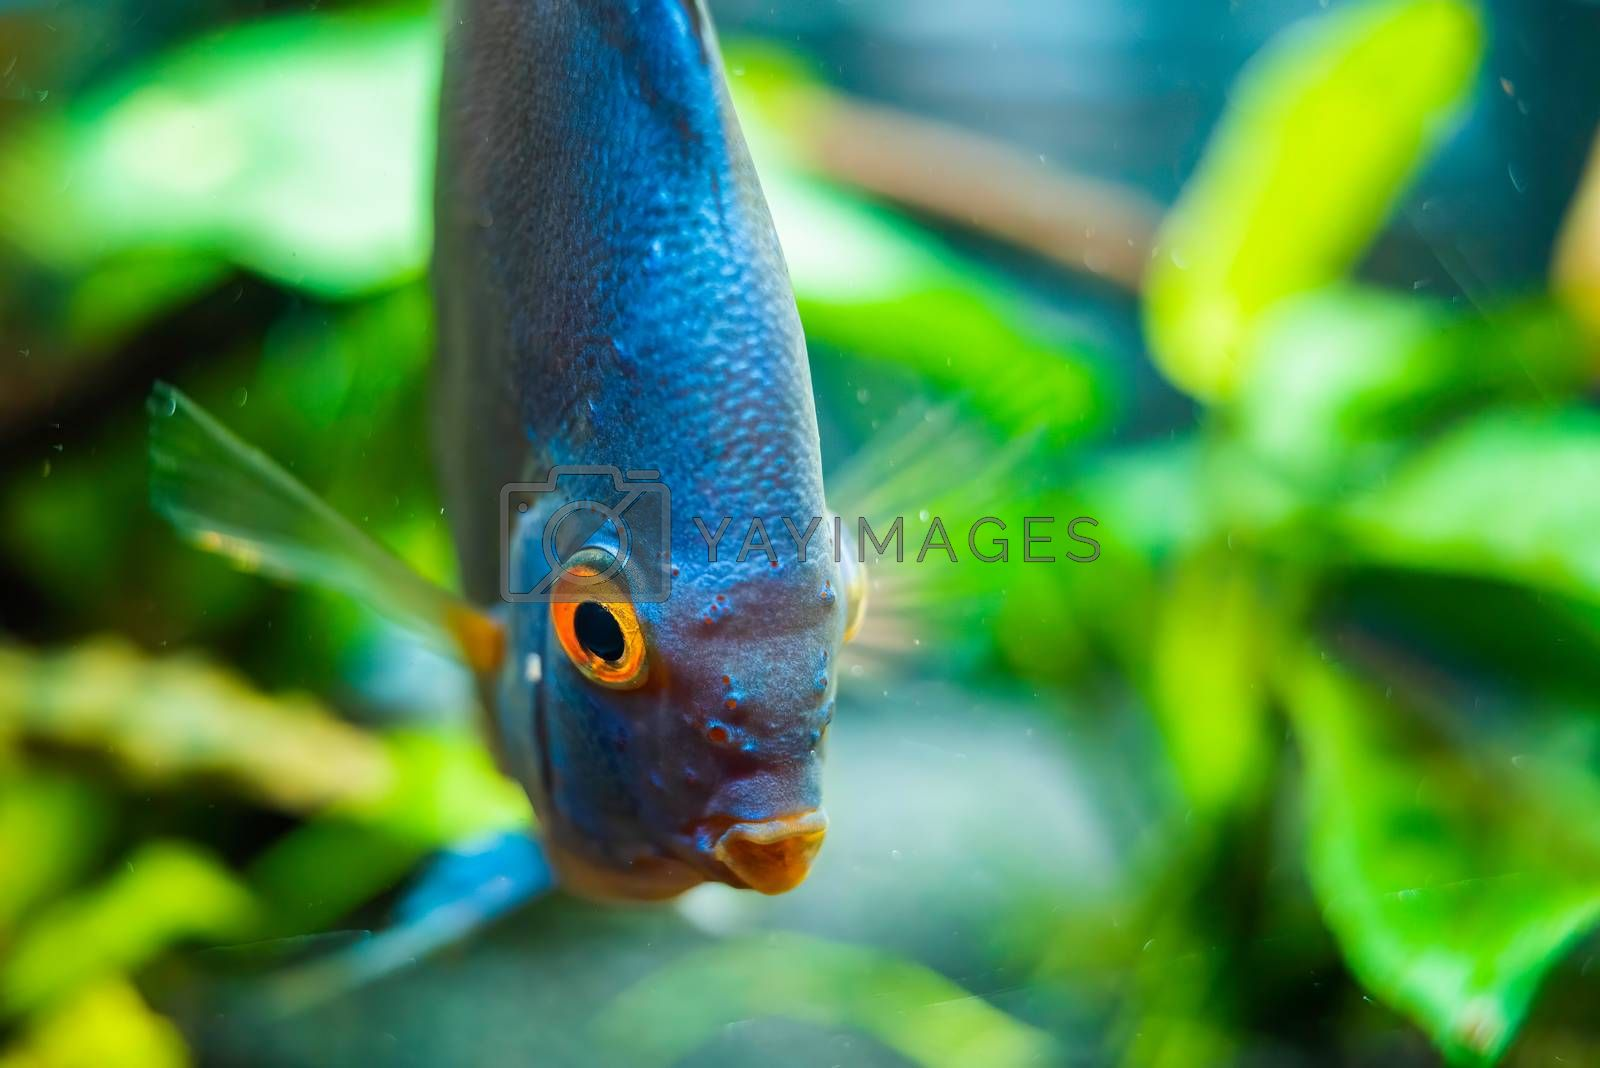 Discus fish detailed close up in the aquarium by Madphotos